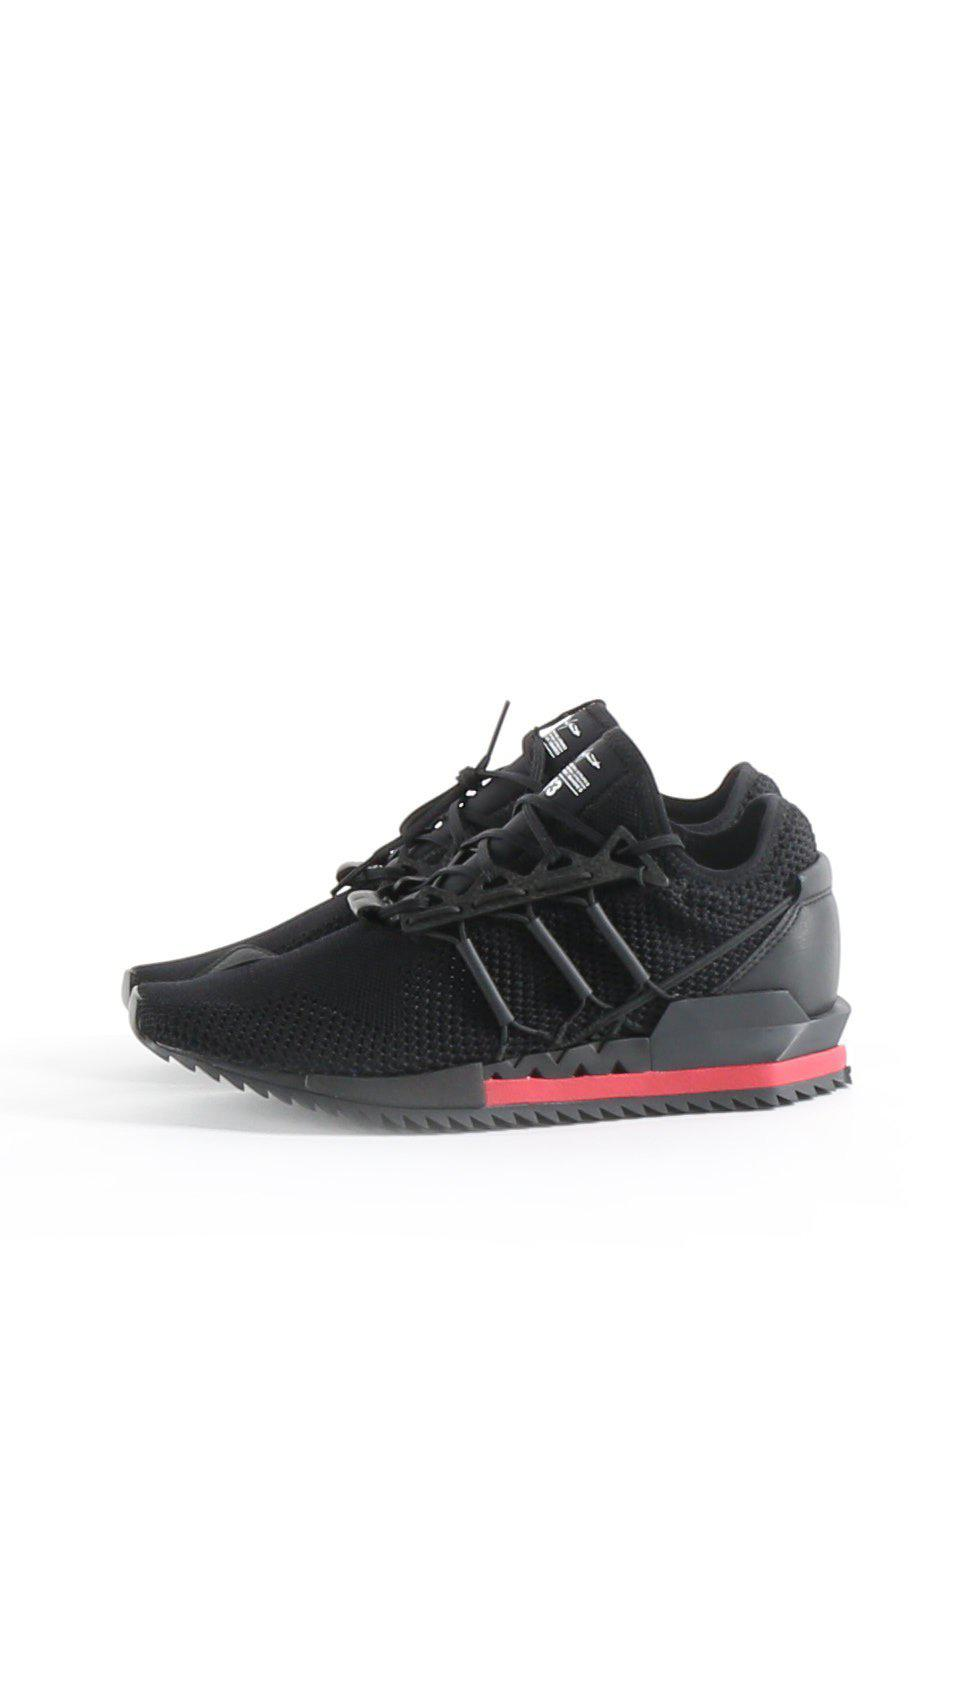 52269aece6b3 Lyst - Y-3 Y-3 Harigane Sneaker In Core Black  Core White  Chili ...